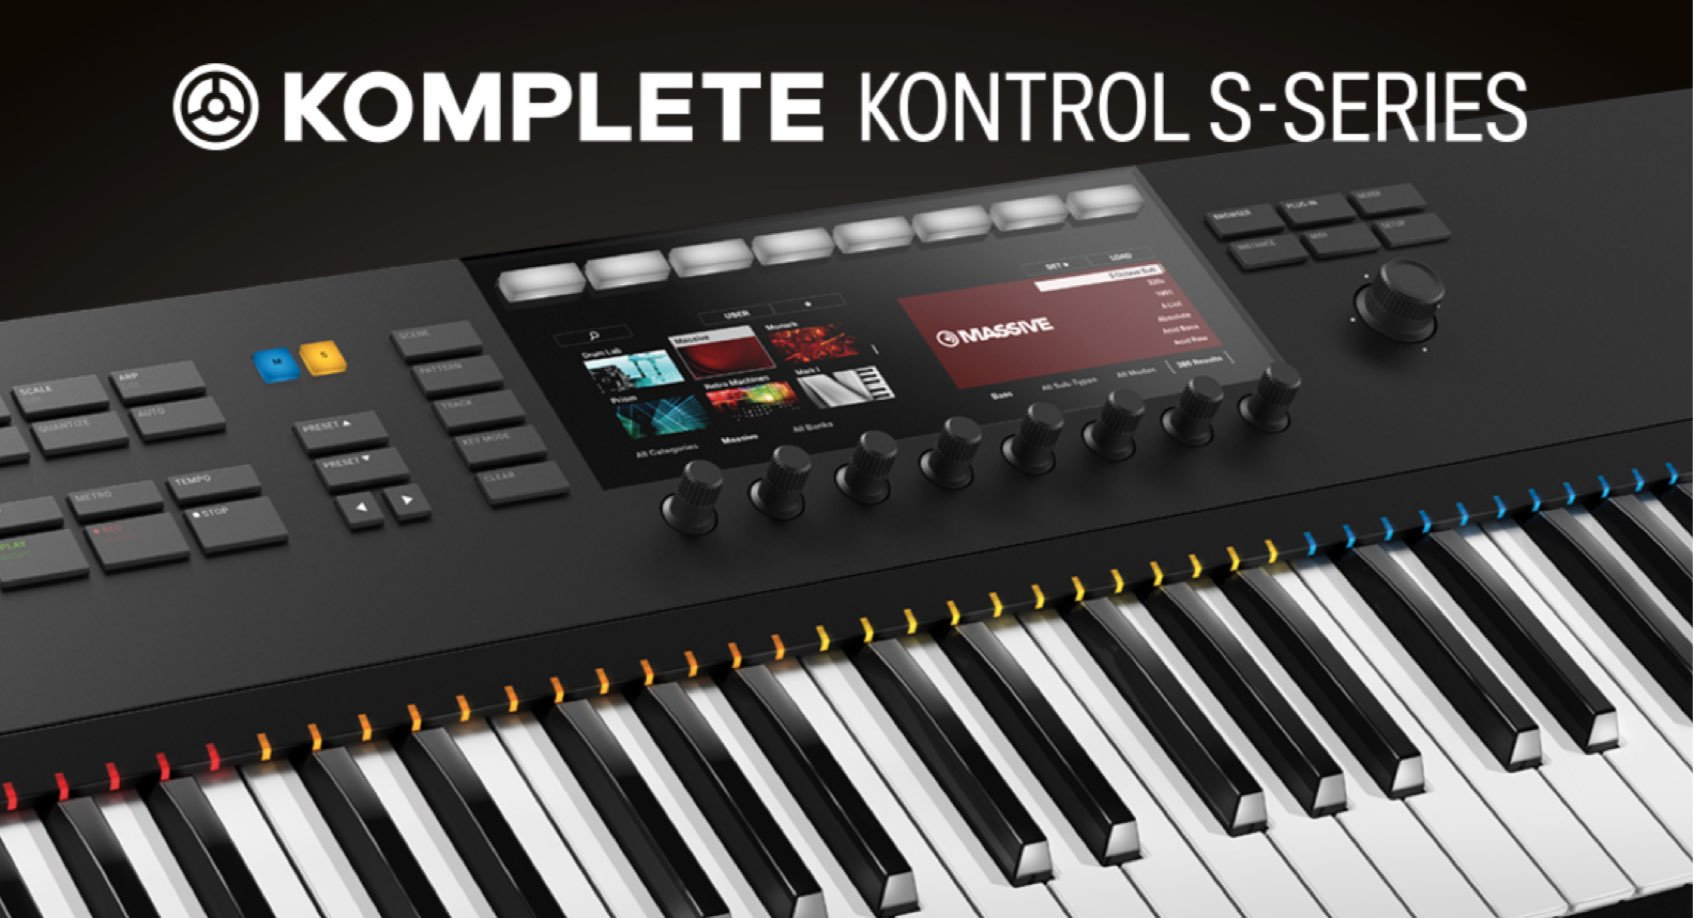 KompleteKontrol-1